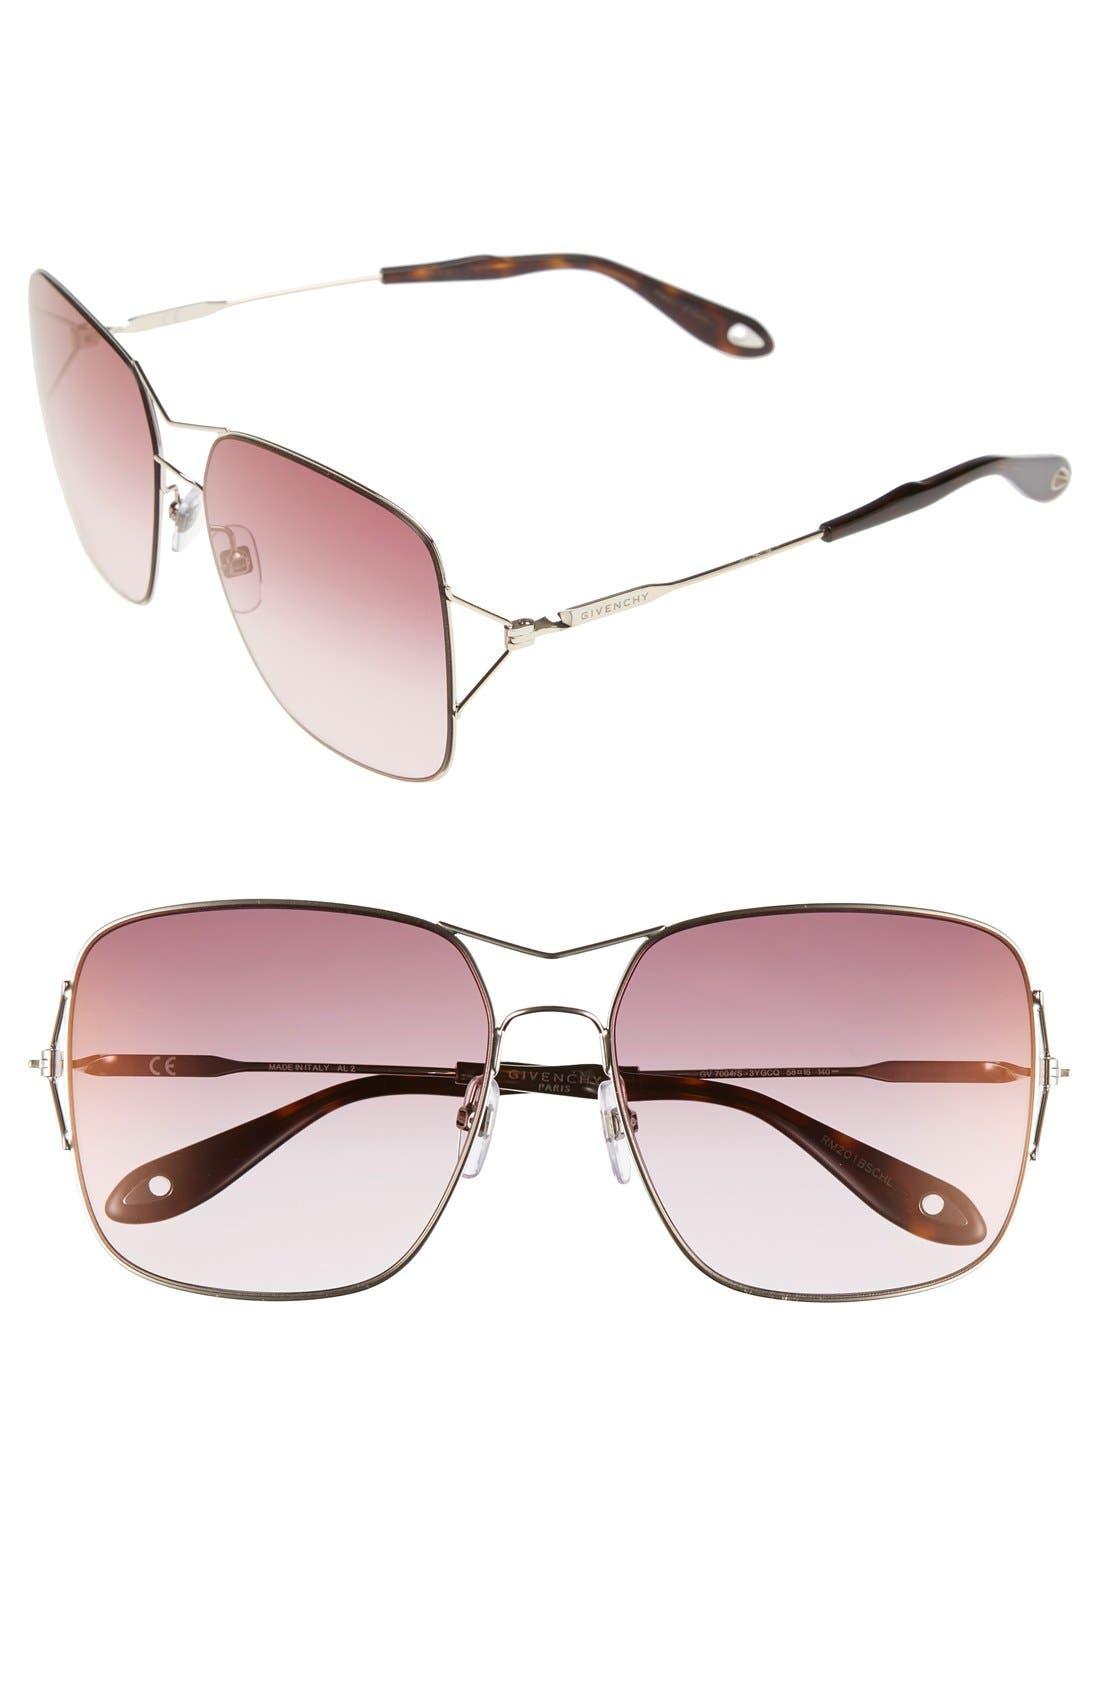 58mm Sunglasses,                             Main thumbnail 4, color,